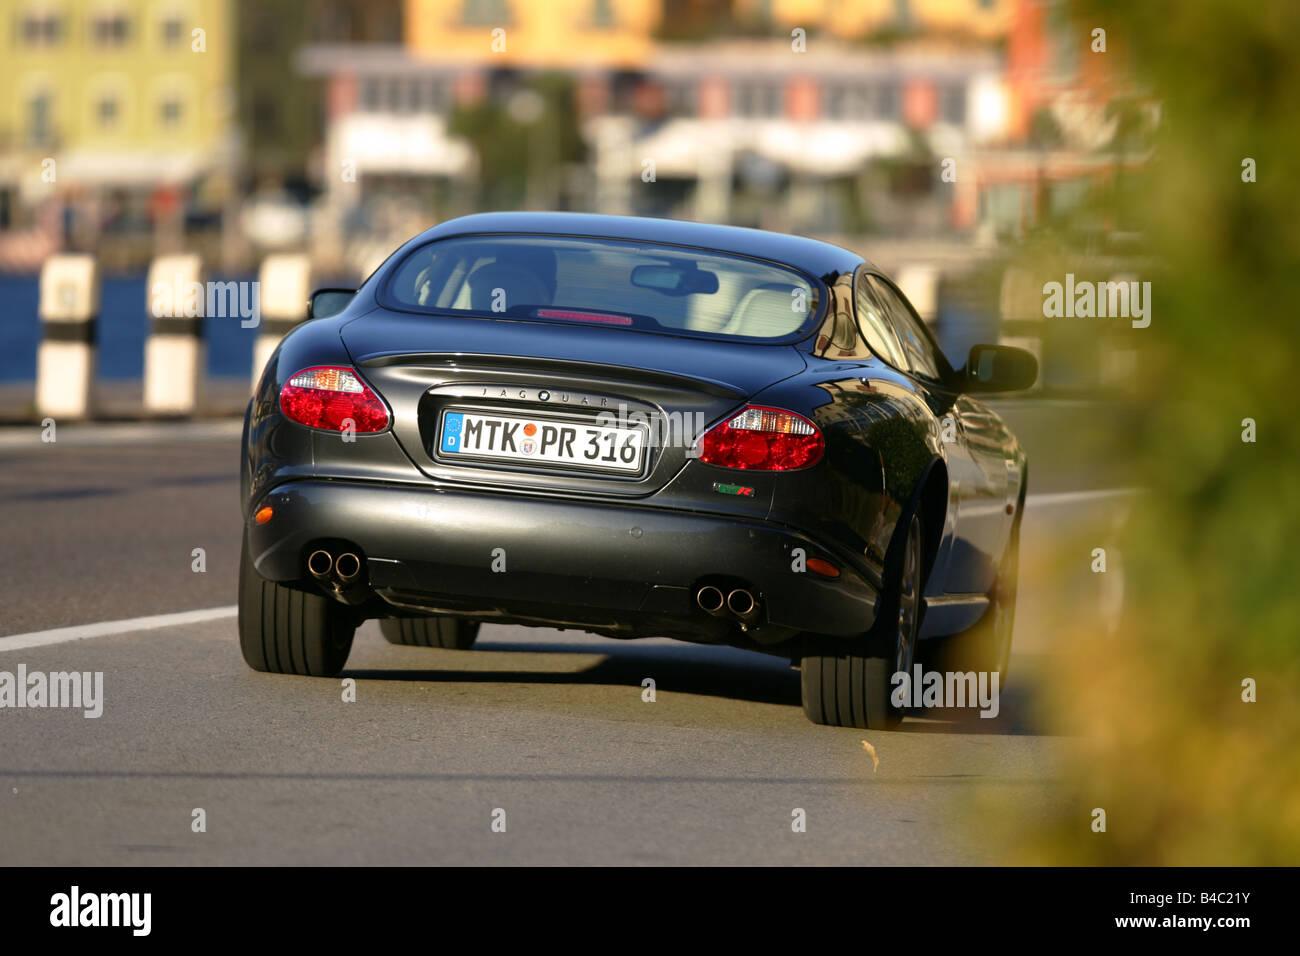 Car Jaguar XKR coupeCoupe model year 2004 roadster black